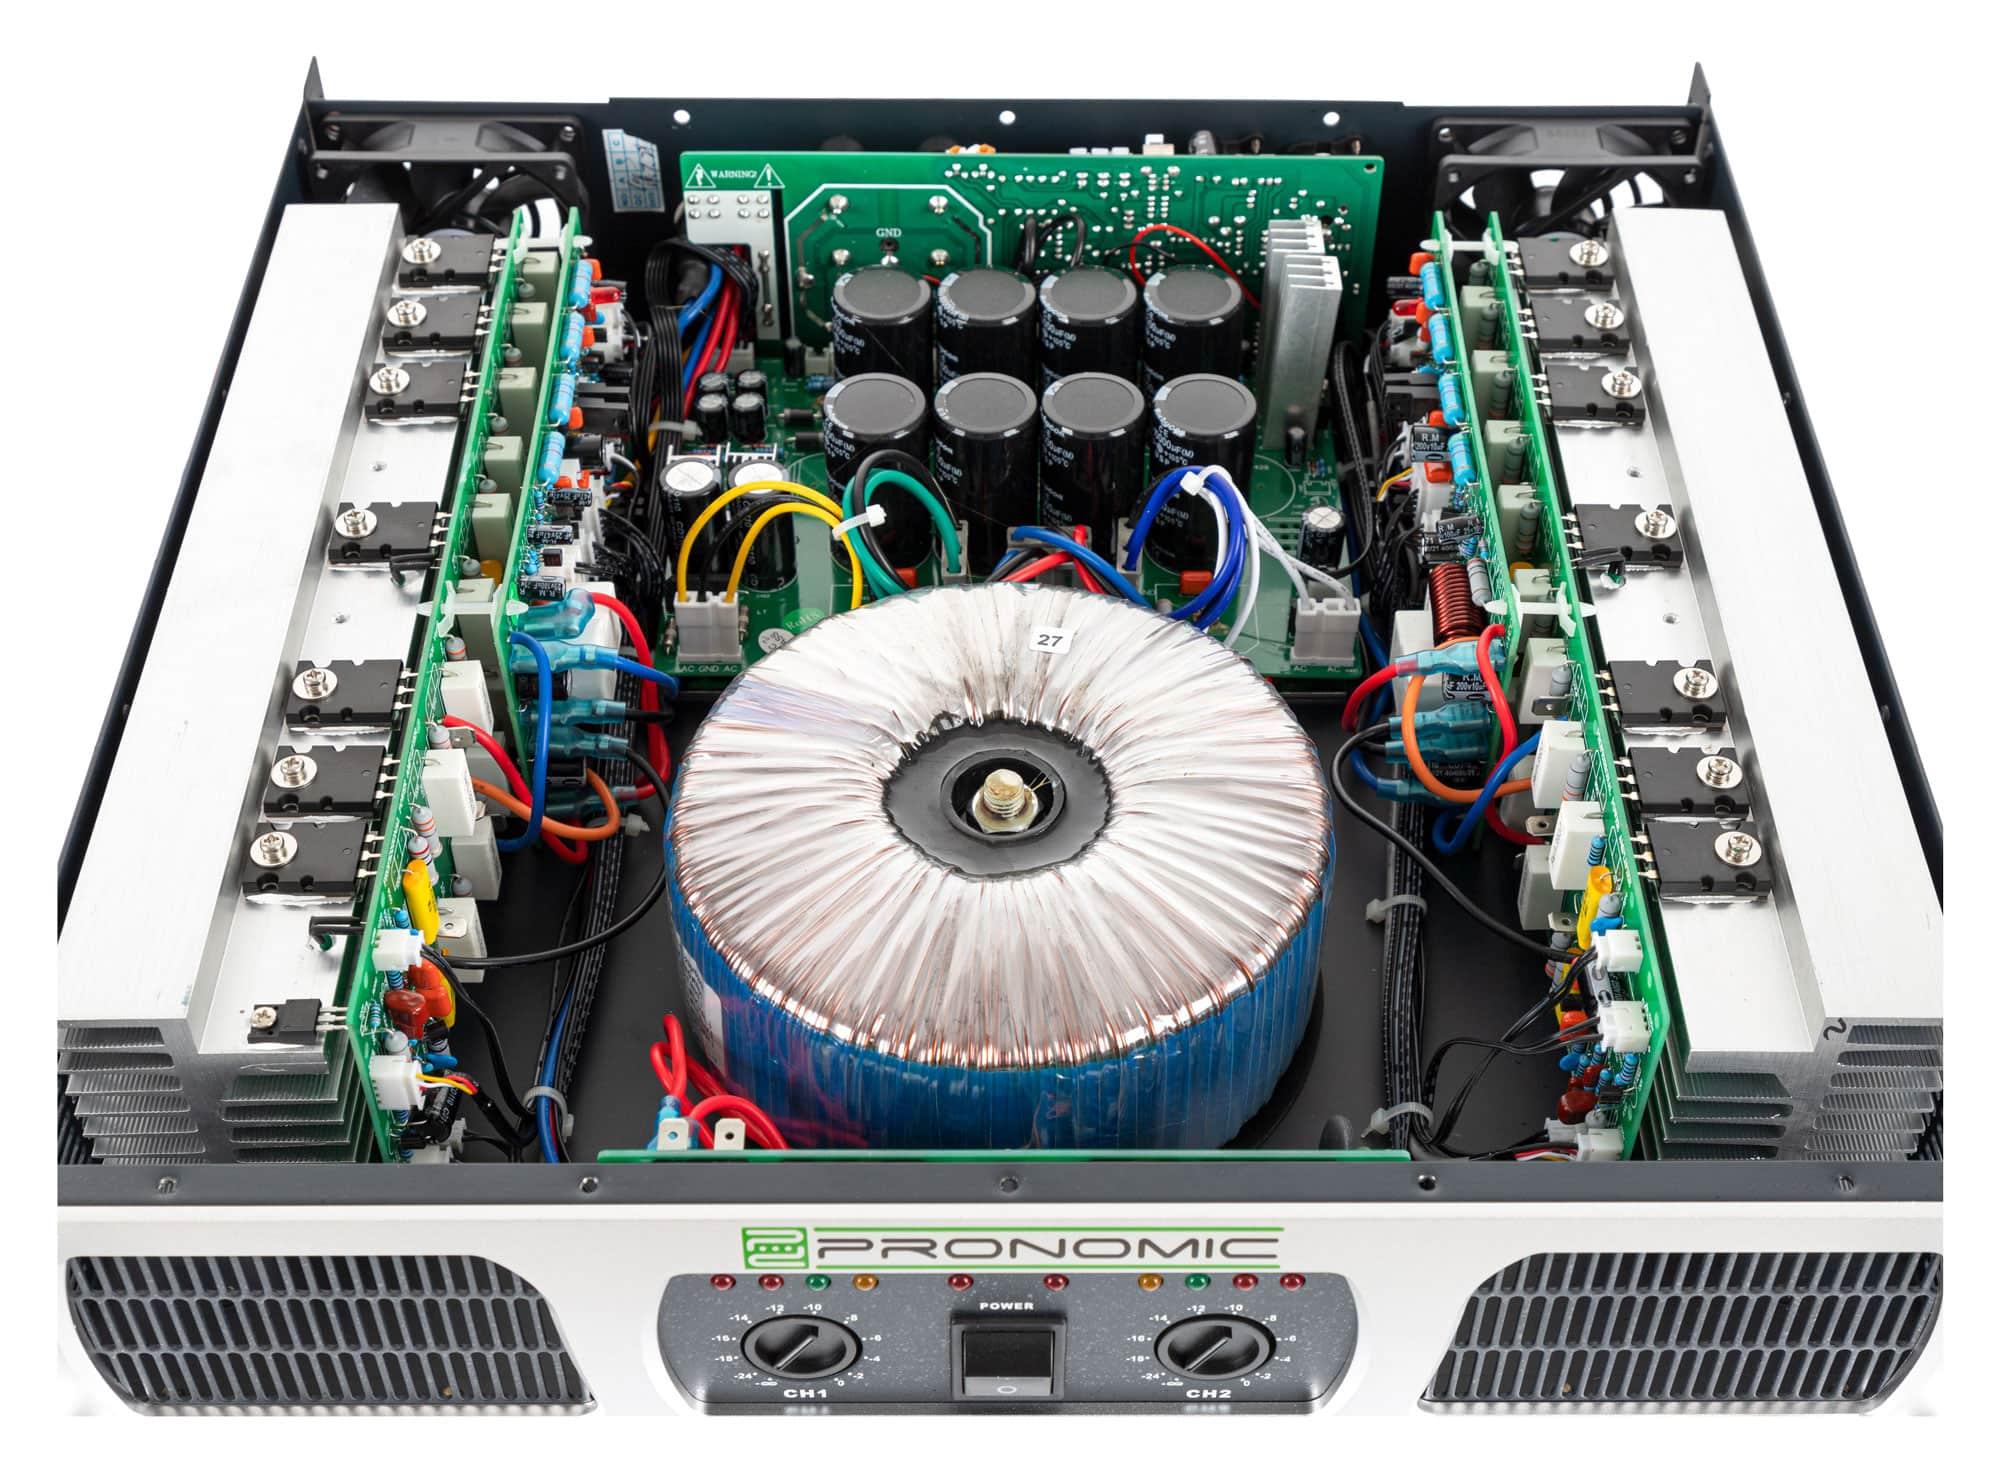 Pronomic Tl 400 Power Amplifier 2 X 1000 Watts Bridging Adapter For Amplifiers Icon